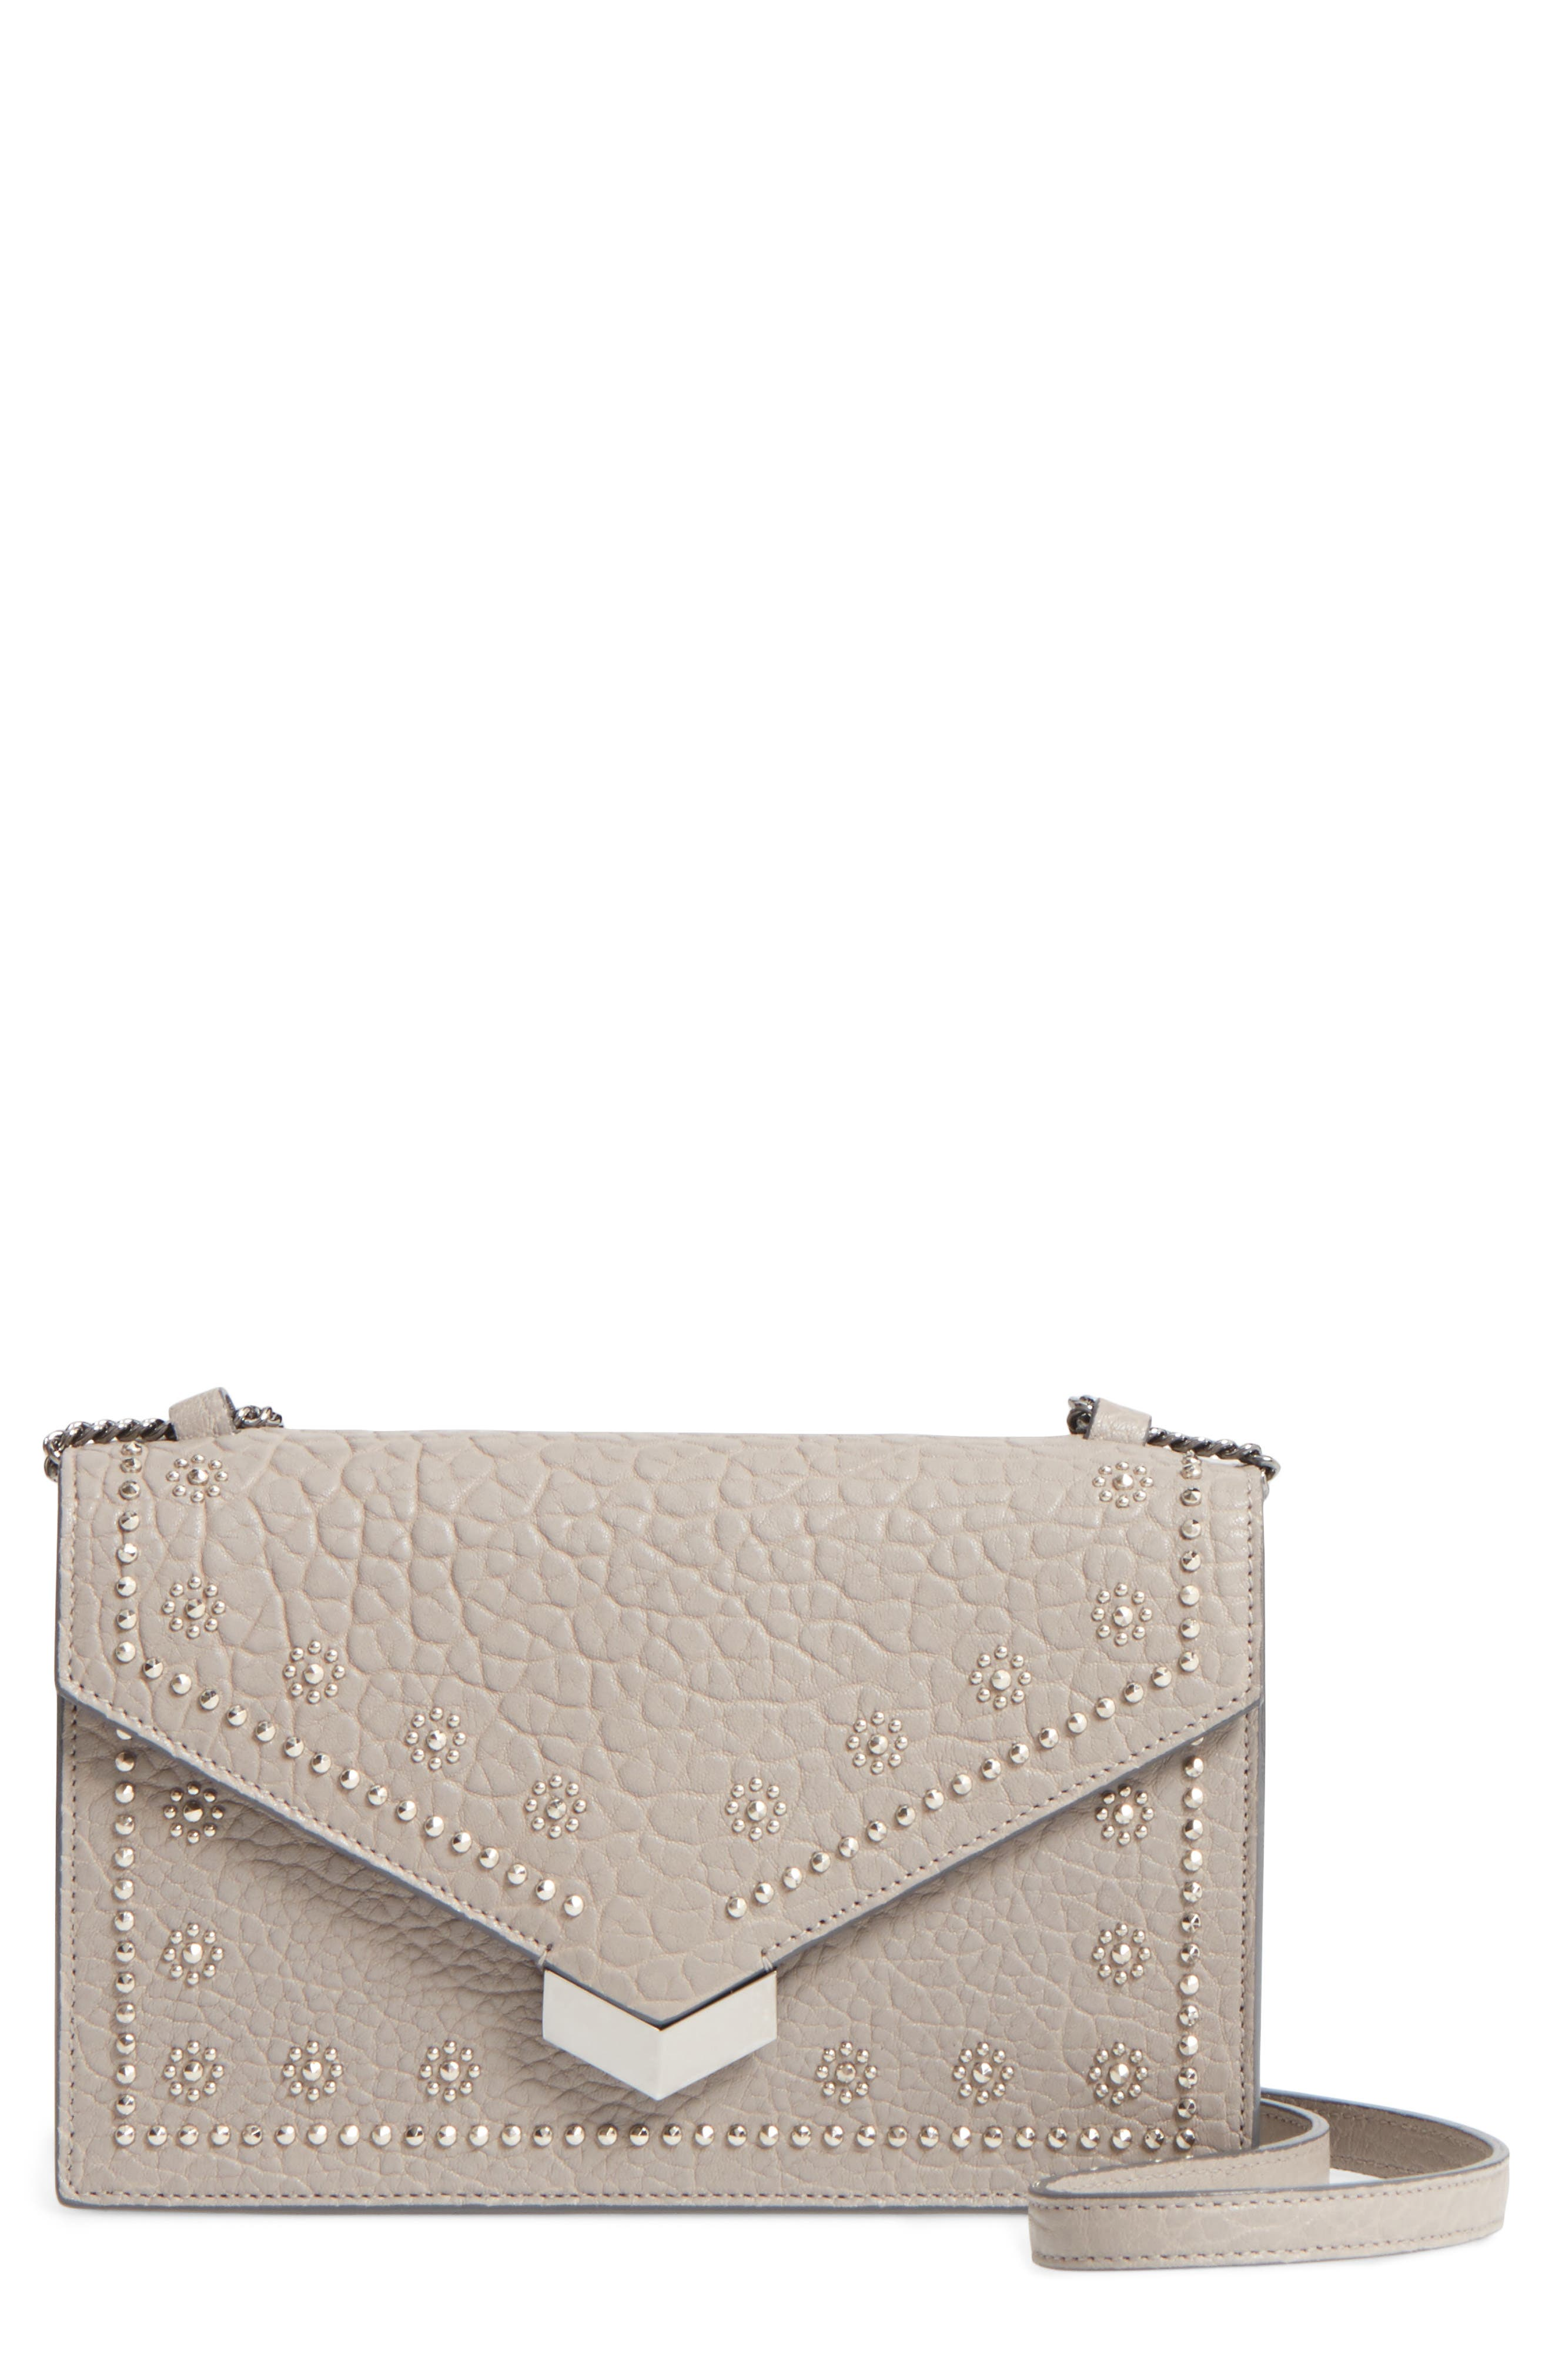 Jimmy Choo Leila Grainy Lambskin Leather Crossbody Bag